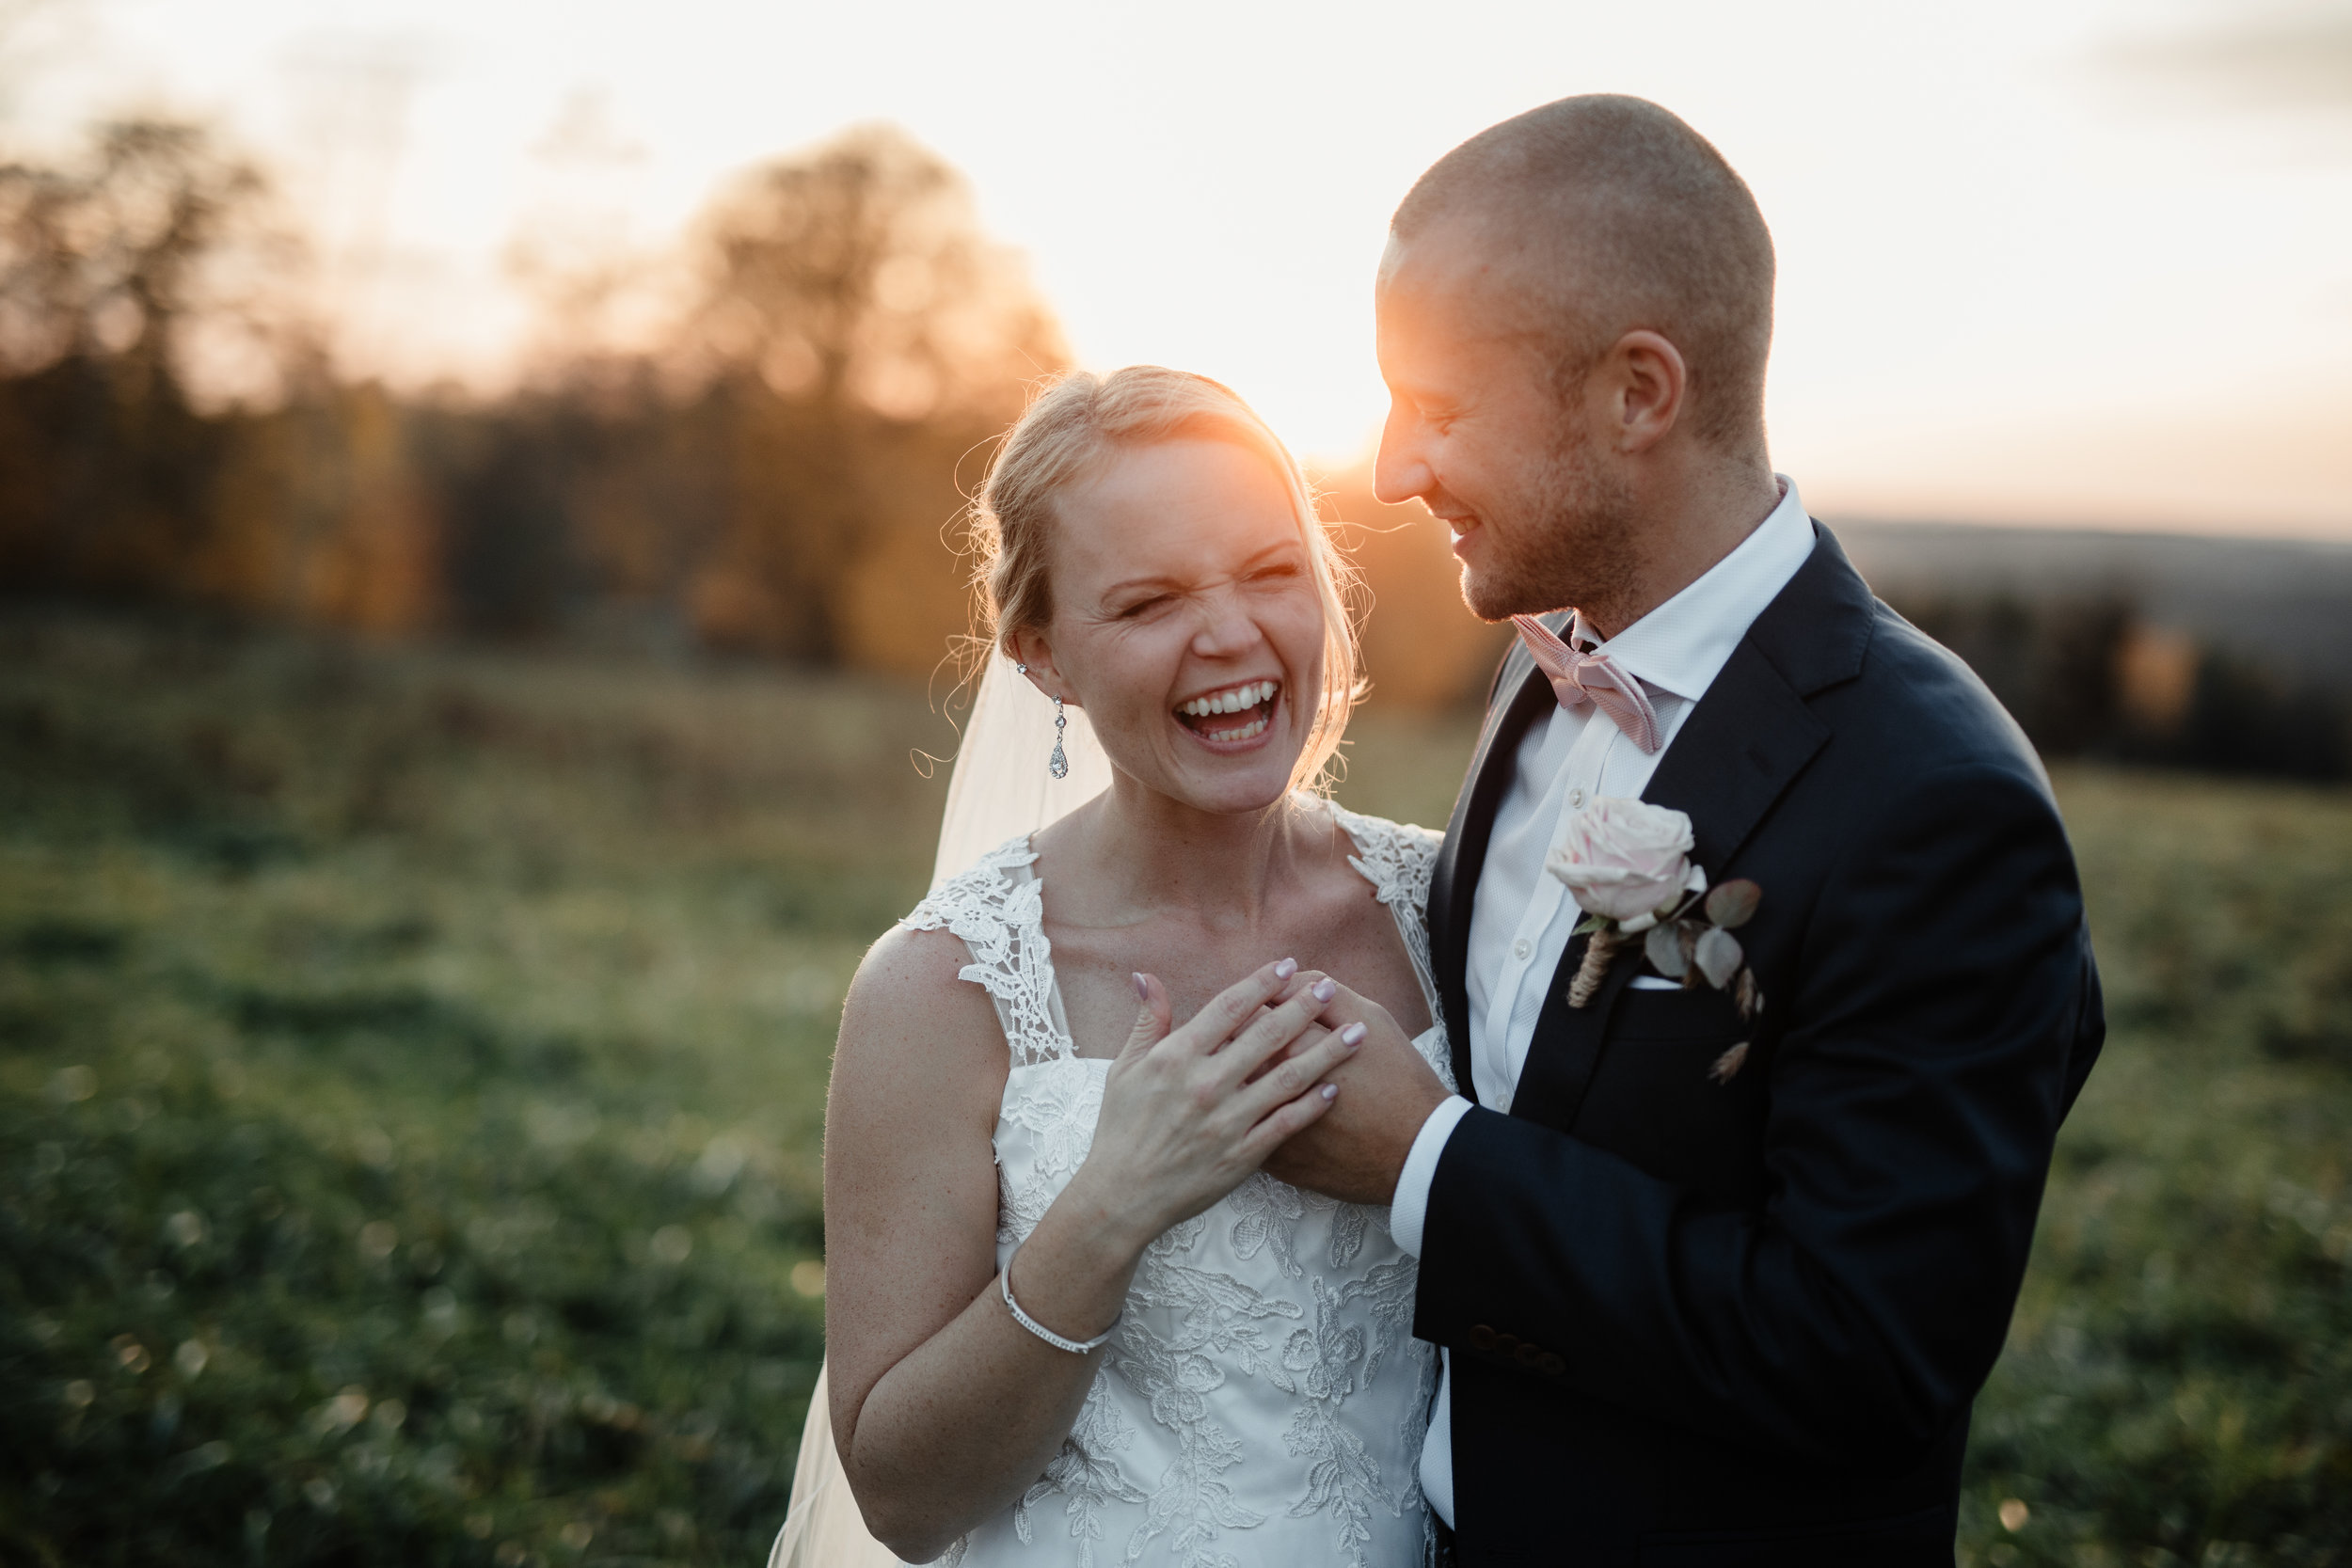 Bröllopsfotograf-Uddetorp Säteri-Höstbröllop-Fotograf Emilia- Bröllopsfotograf Borås-61.jpg